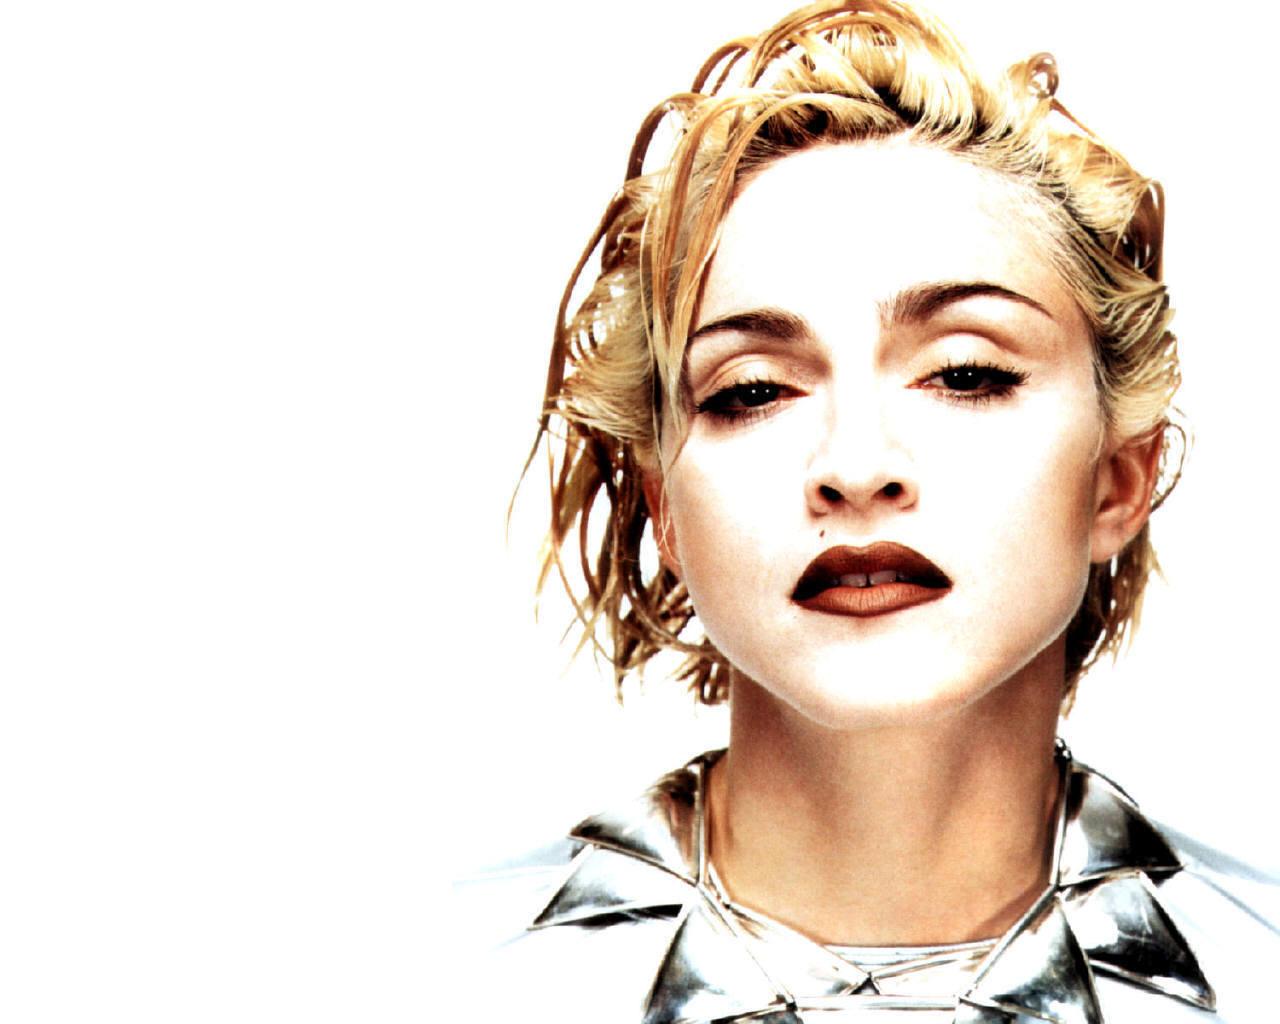 http://4.bp.blogspot.com/_ZmAW3Mp6aPs/TE9Gl3L7EKI/AAAAAAAAAgM/SmT9cpmkyYI/s1600/Madonna-madonna-1262437_1280_1024.jpg